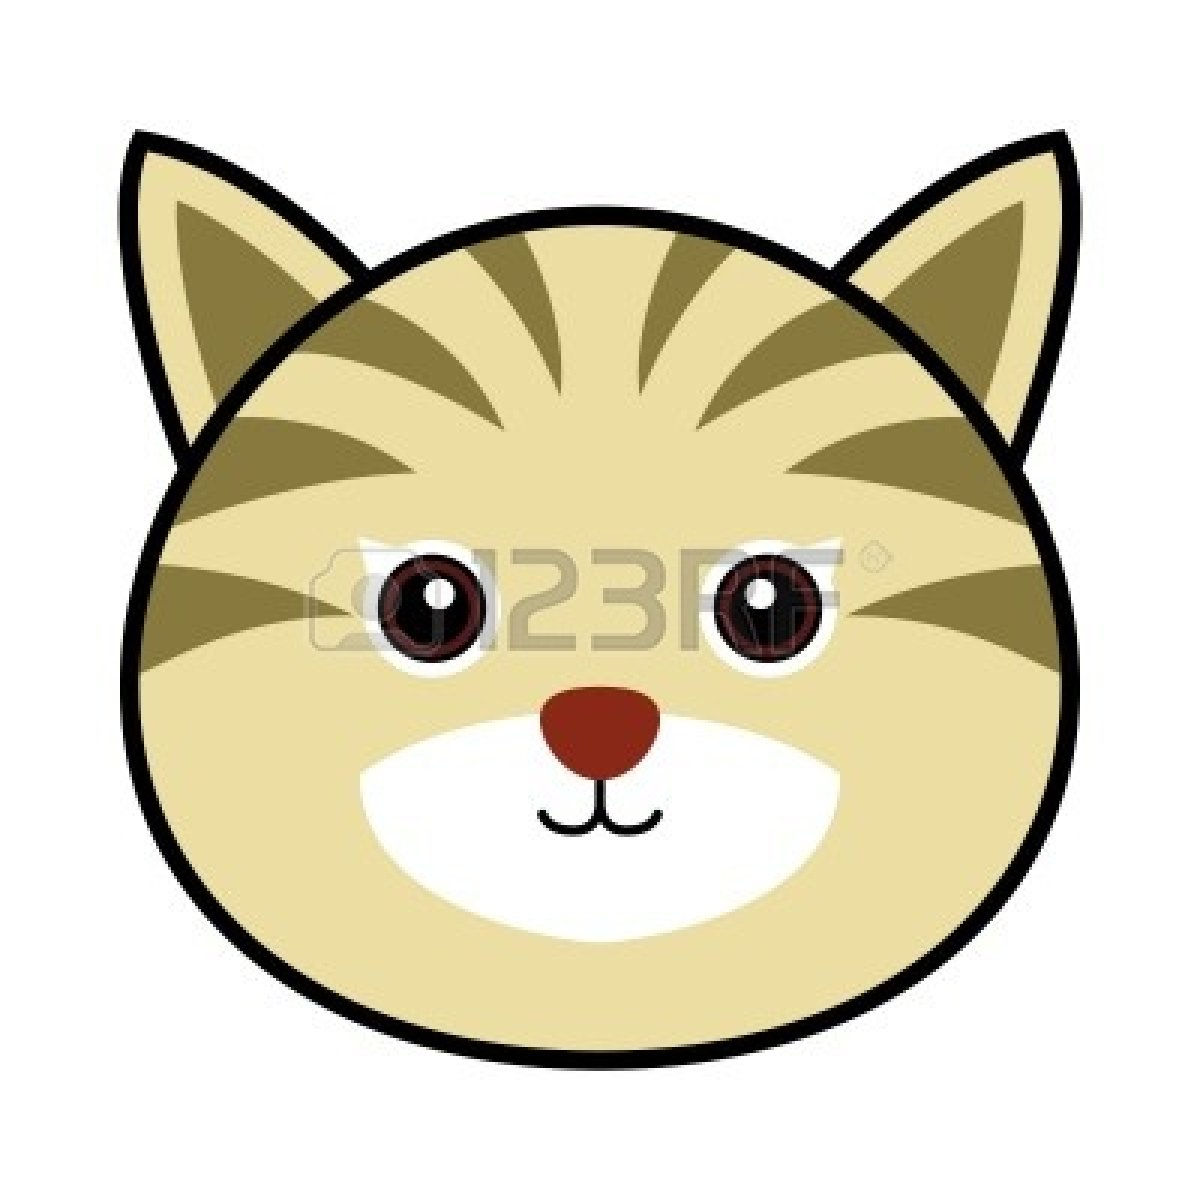 1200x1200 Sad Clipart Cat Face